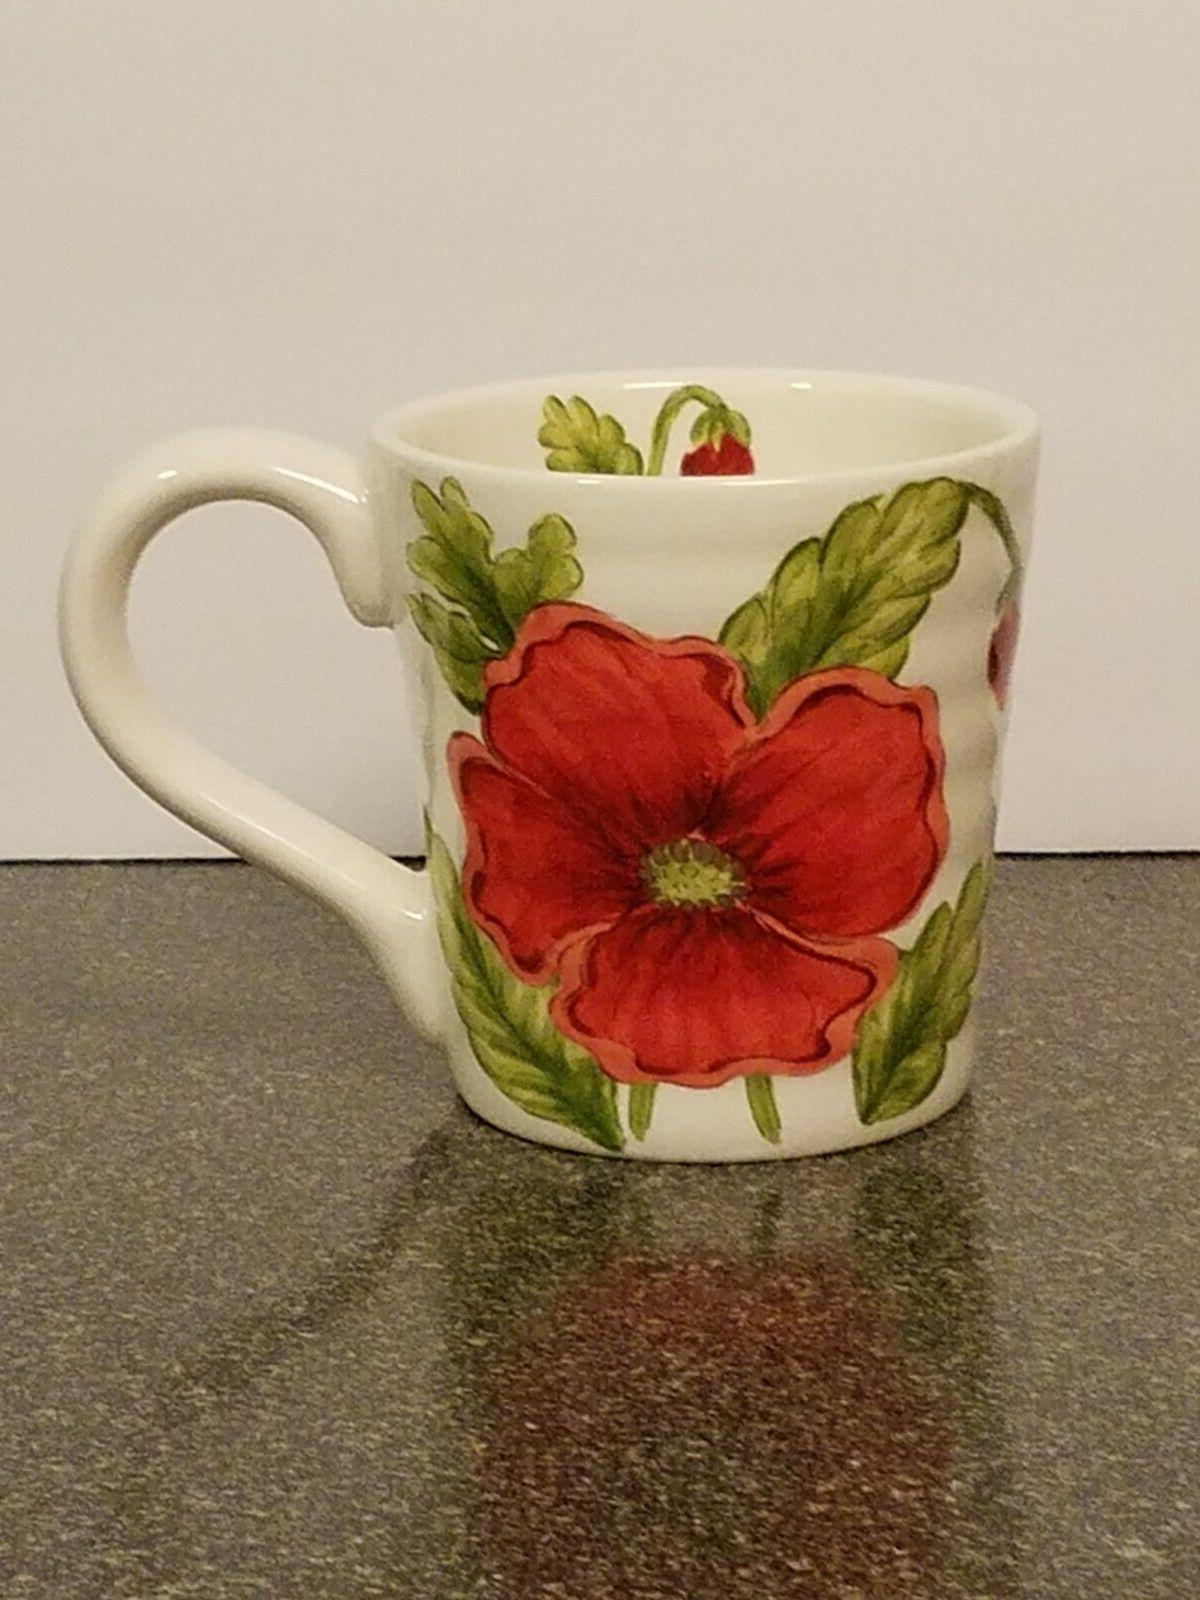 4 Maxcera Mugs  - RED POPPIES ~ Mug SET OF 4  Tea, Coffee Cu